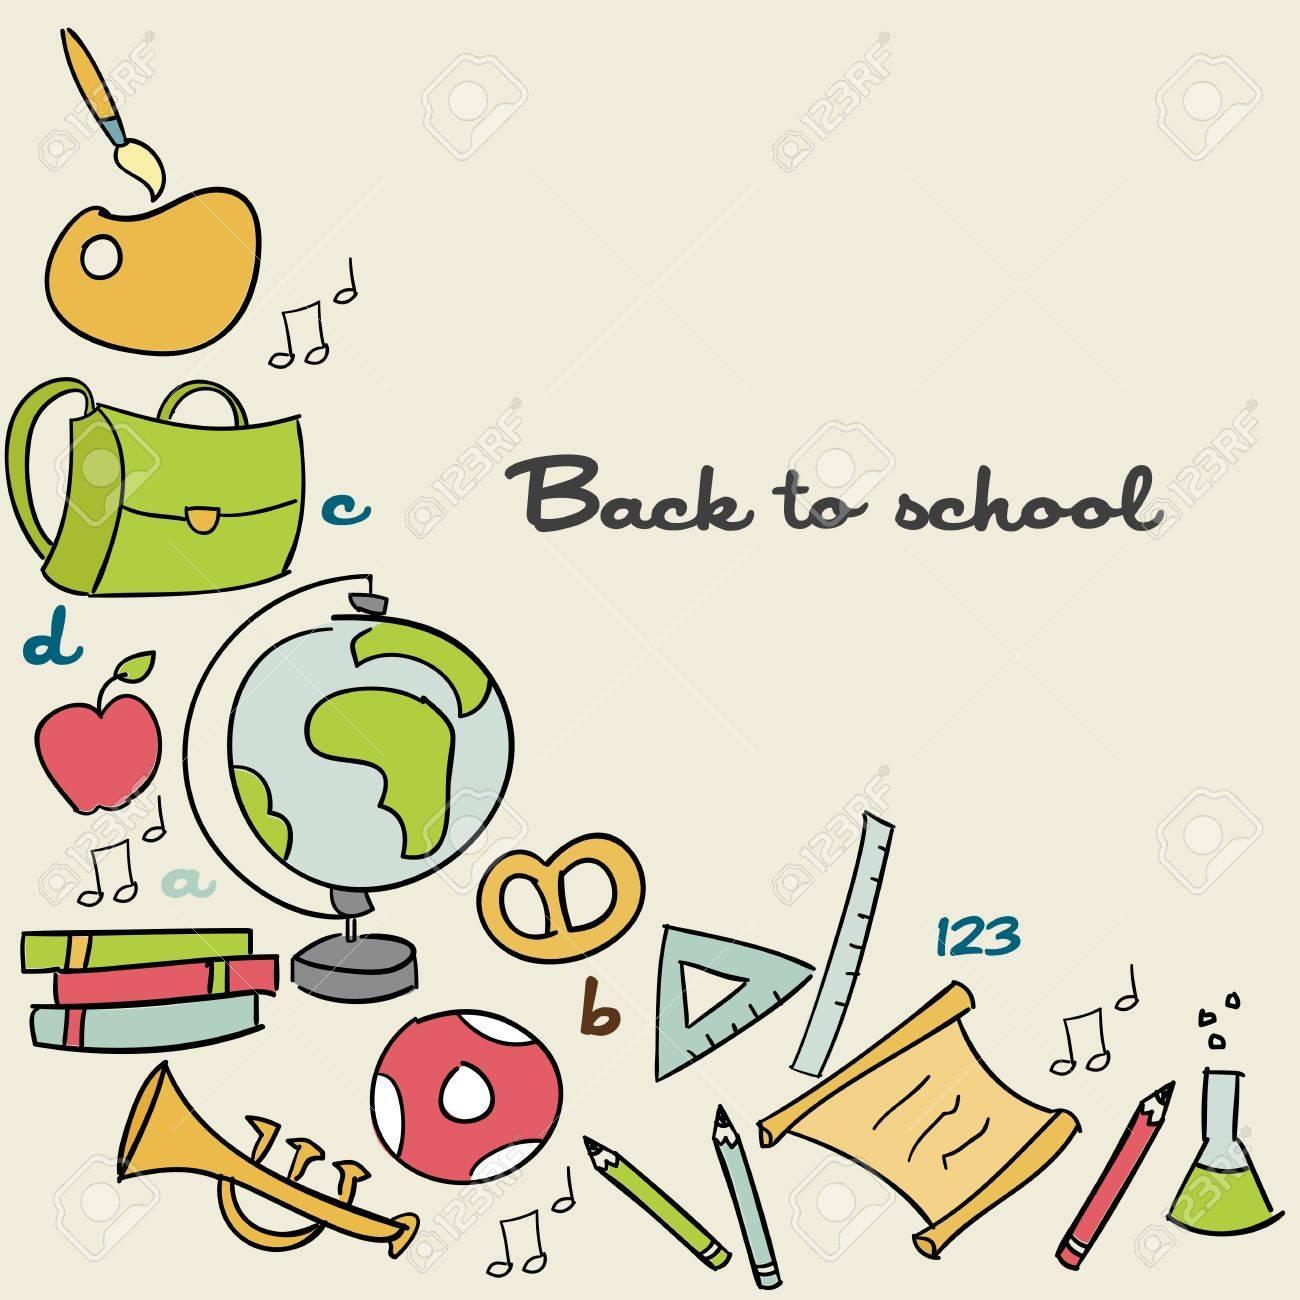 School bag diagram - School Bag Back To School Background Vector Illustration